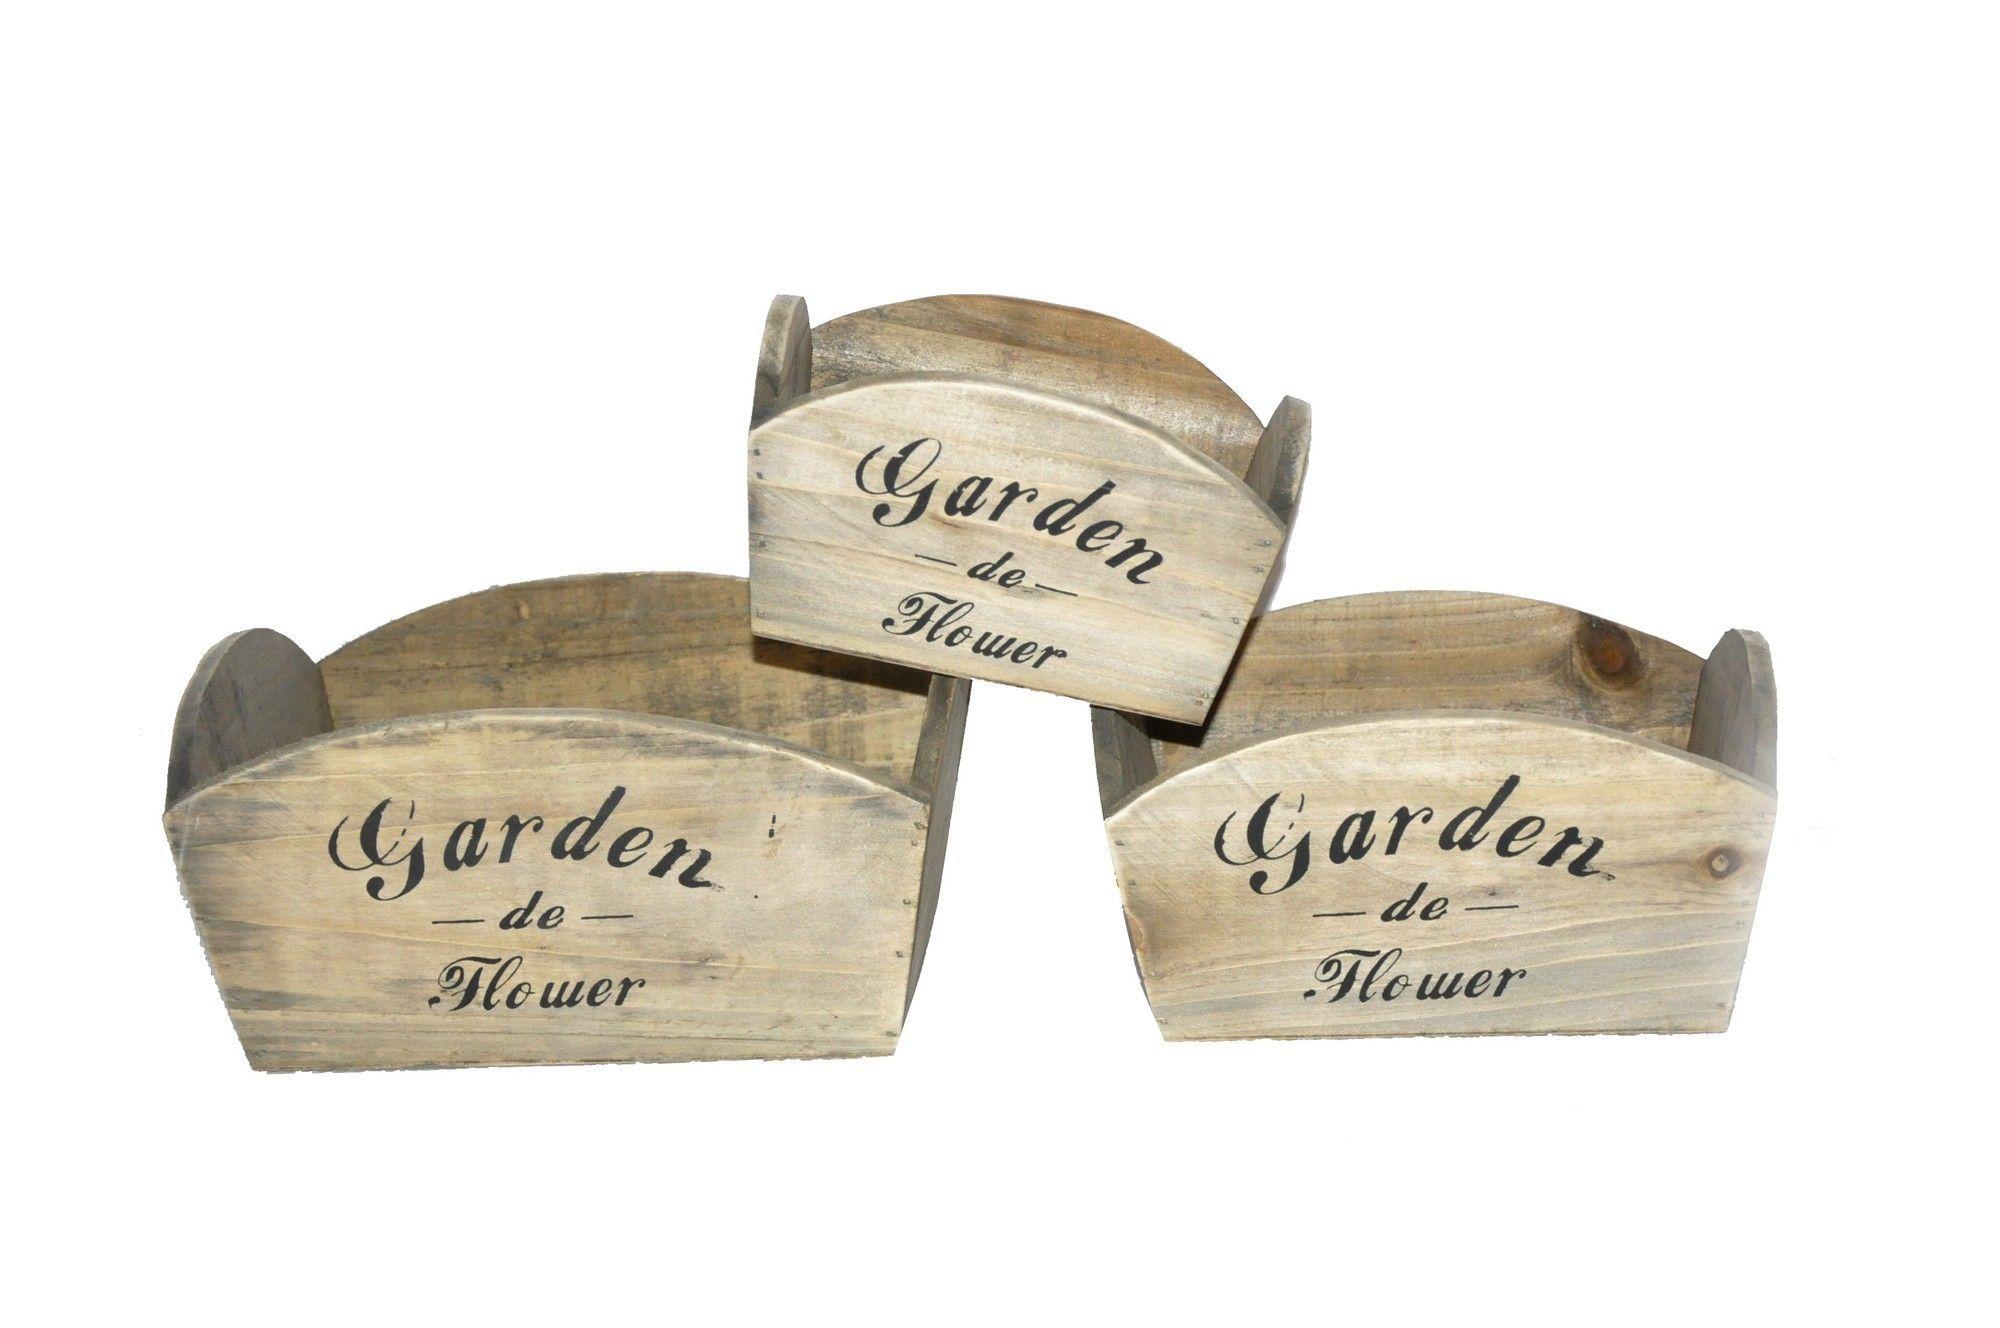 3 piece rectangular planter box set with images